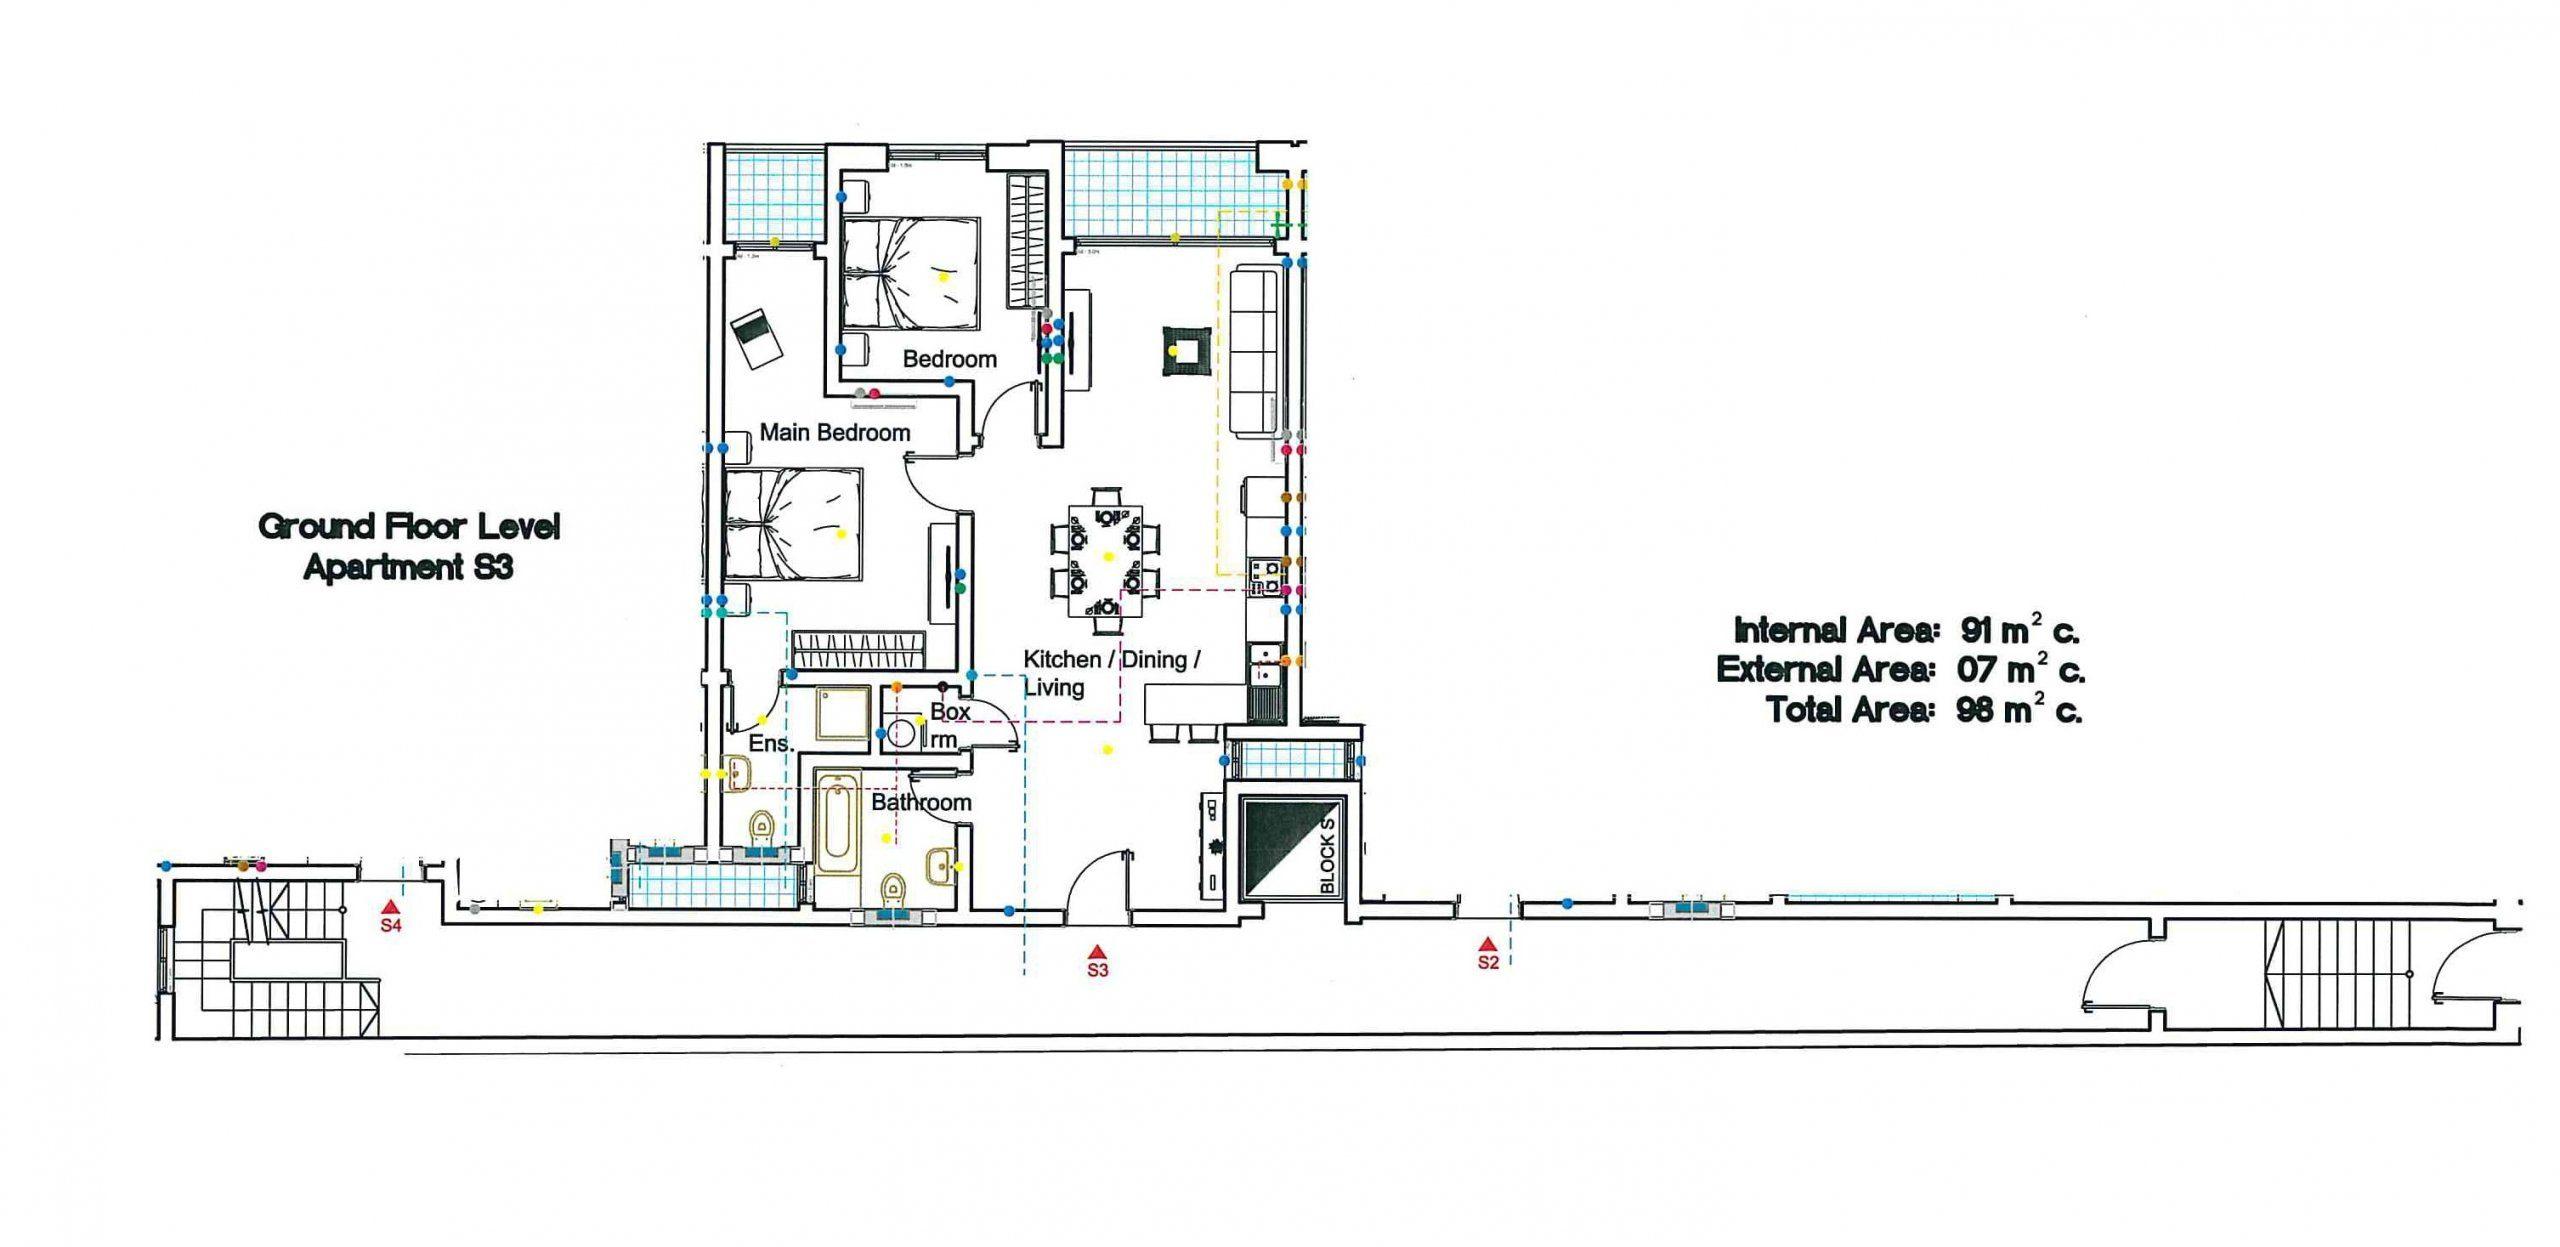 S3 Ground Floor